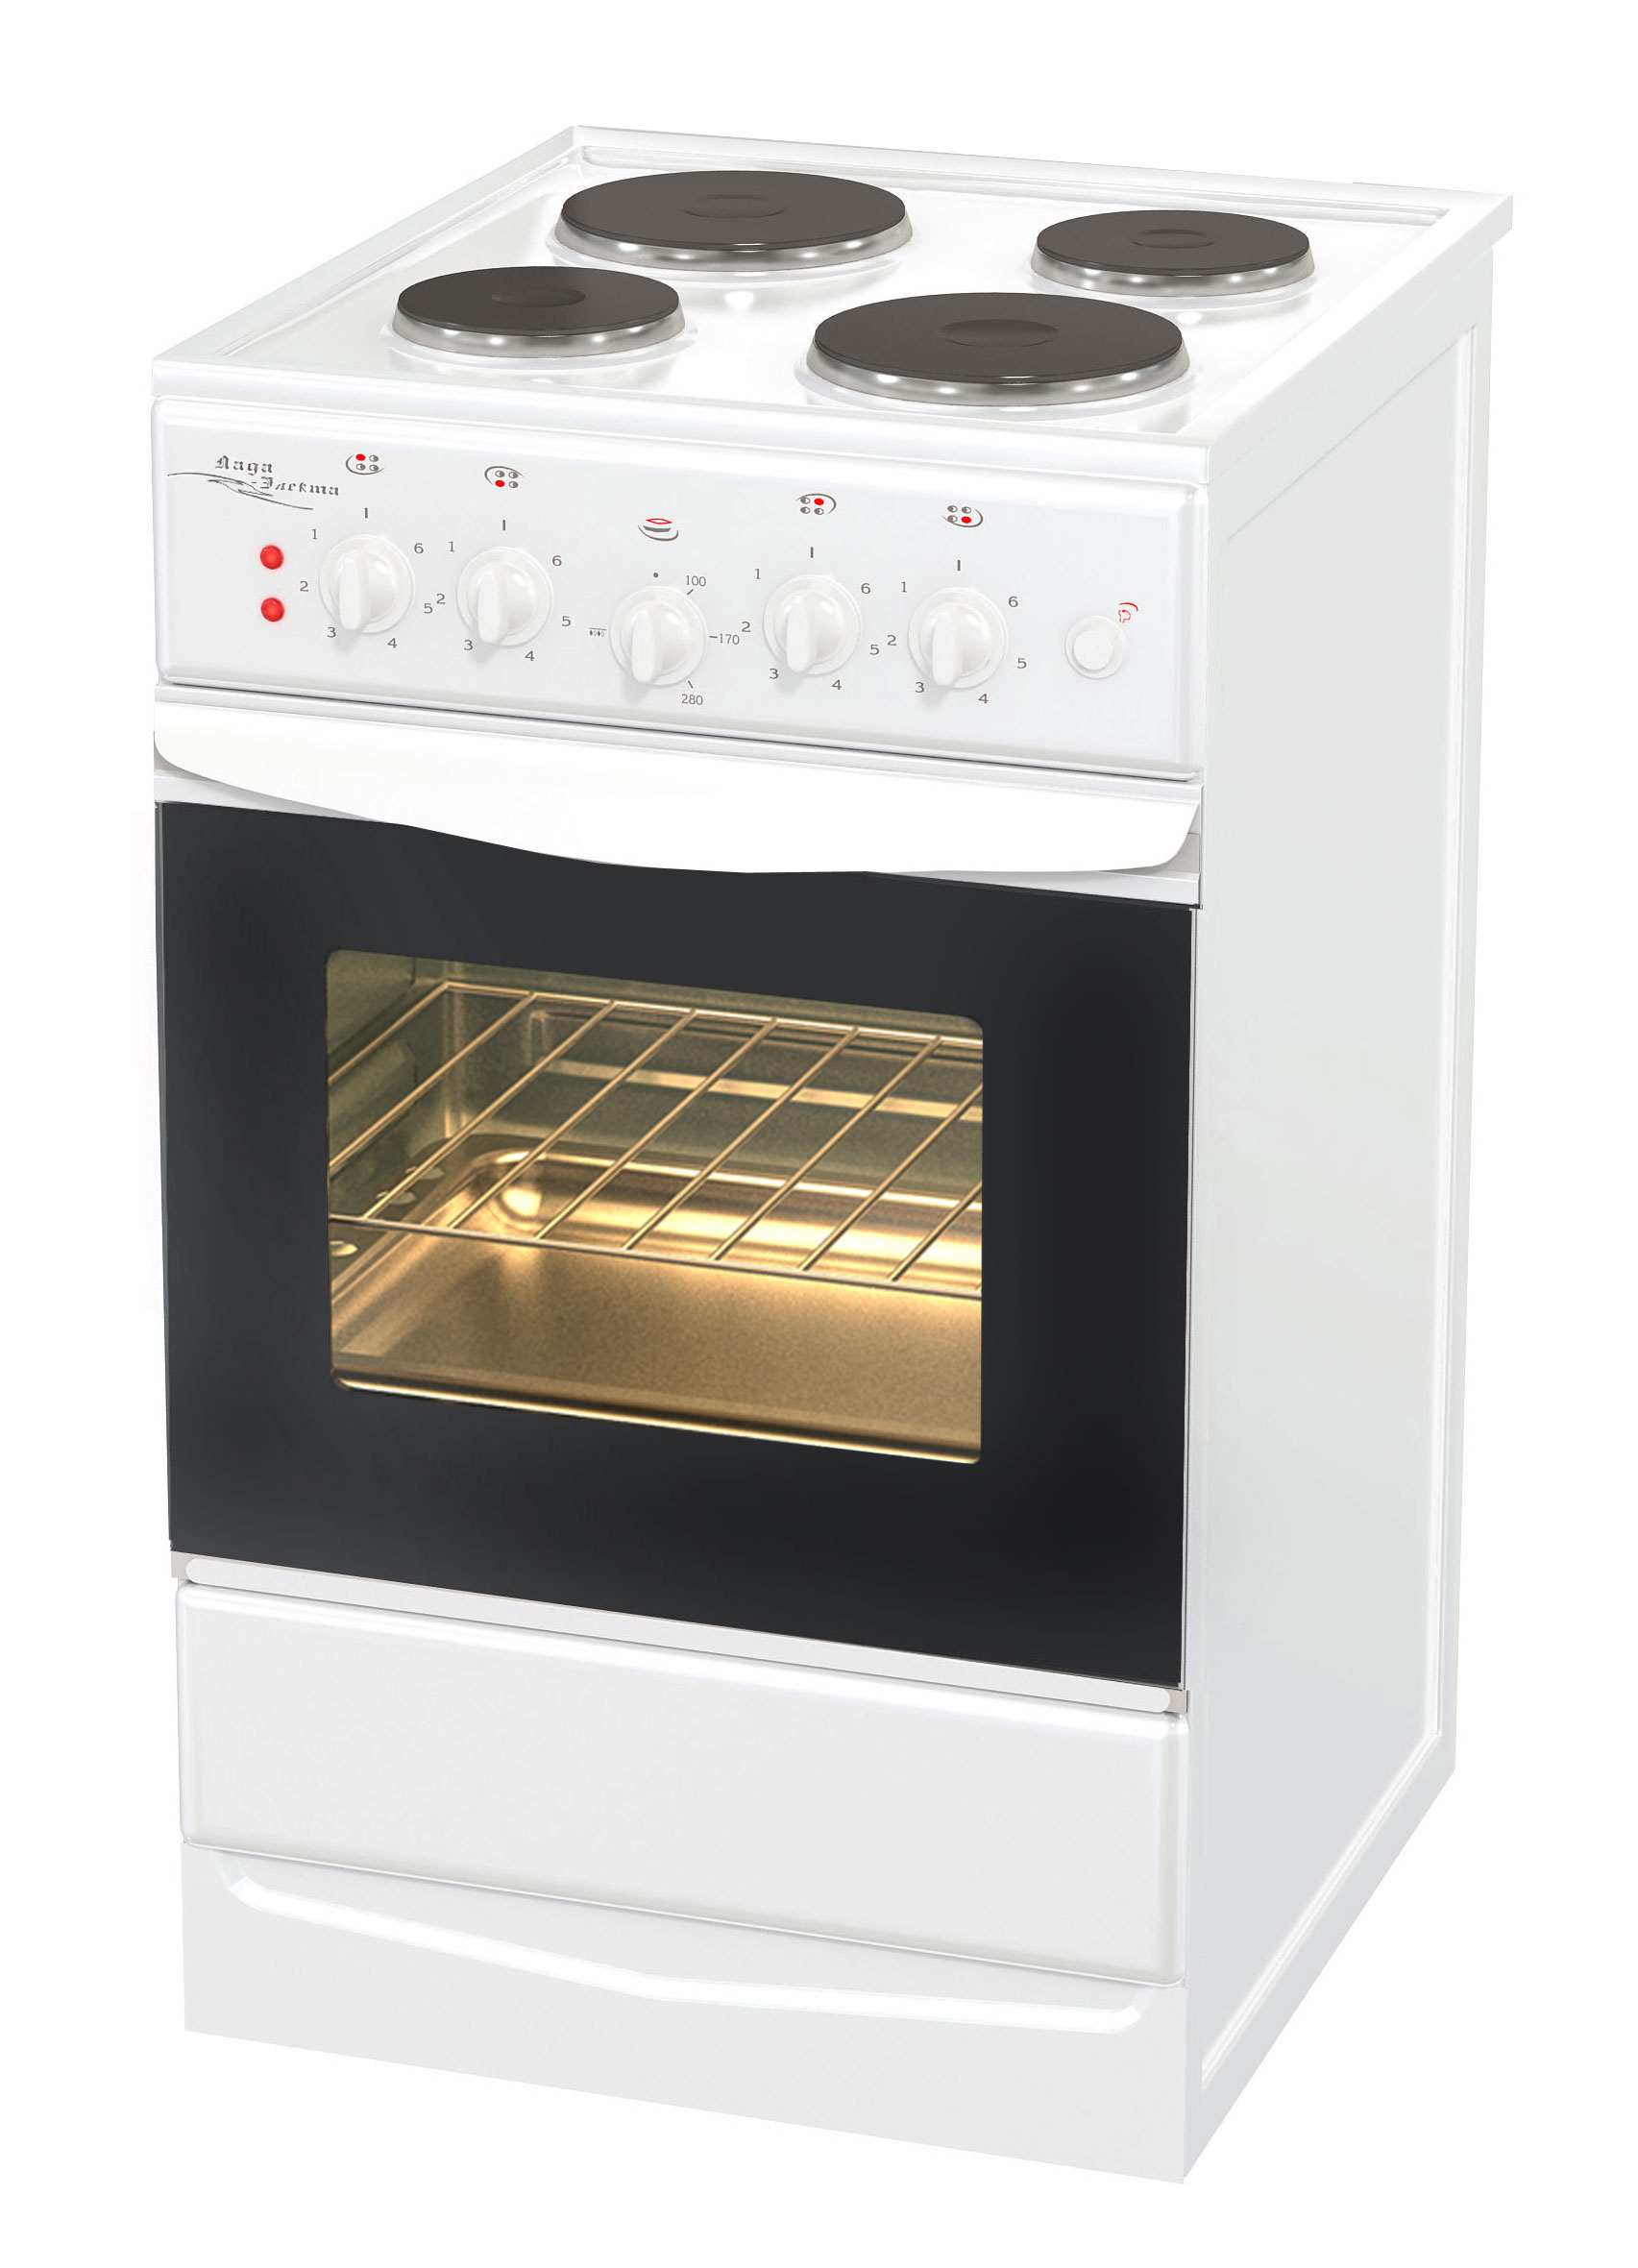 Электроплита кухонная 700х700х850 6000 квт встроенная газовая плита духовой шкаф электро